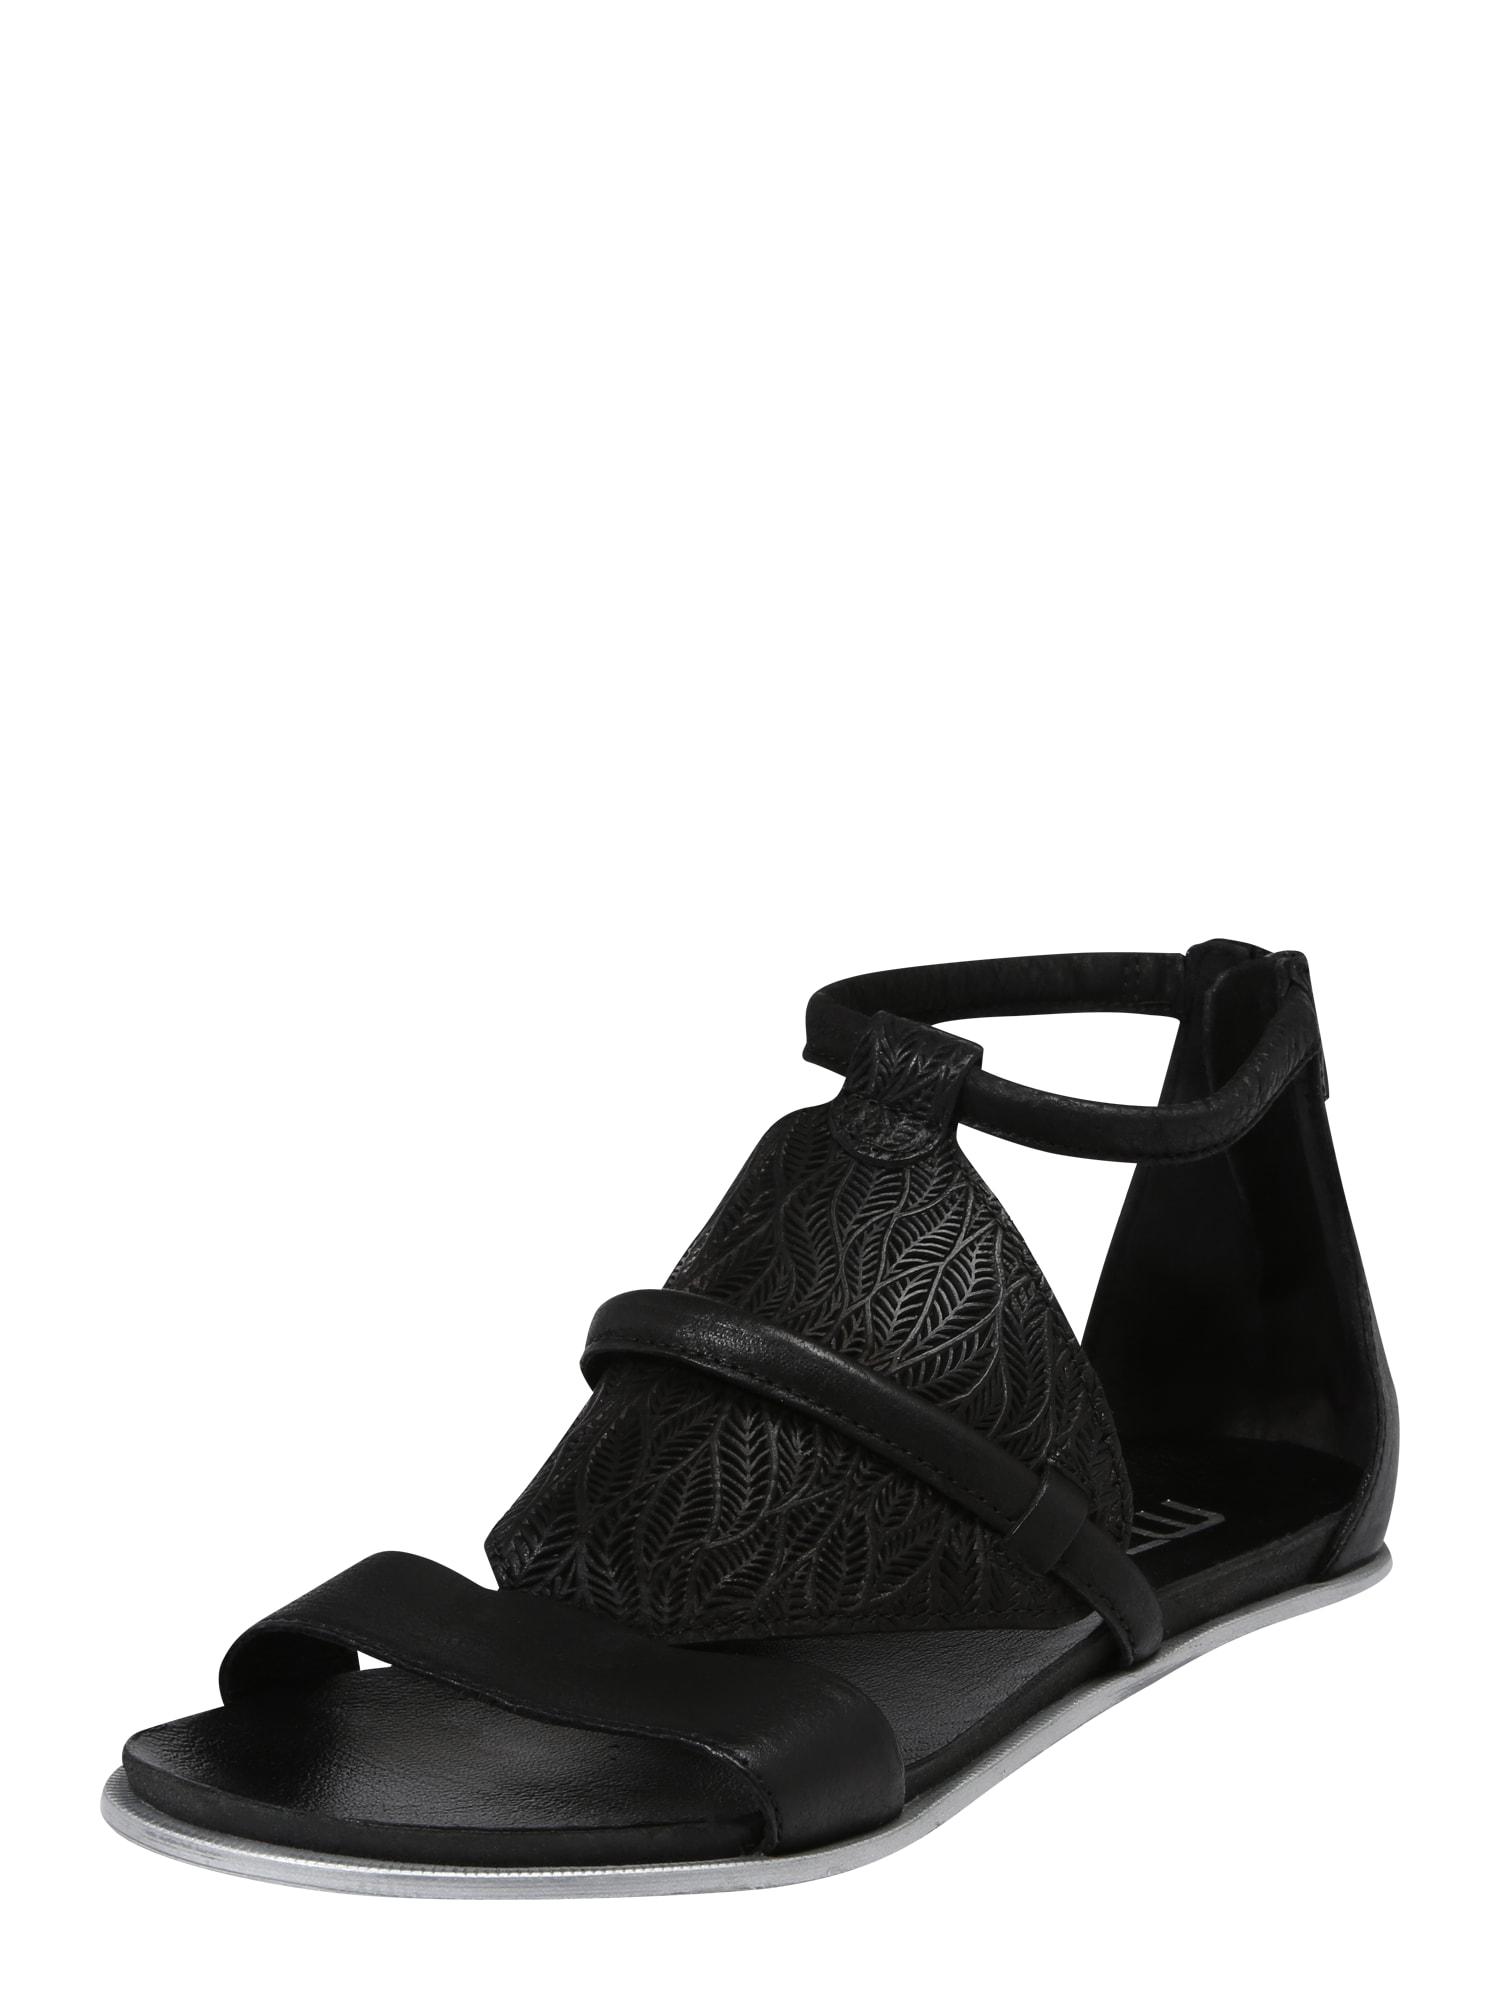 Sandály KATANA černá MJUS